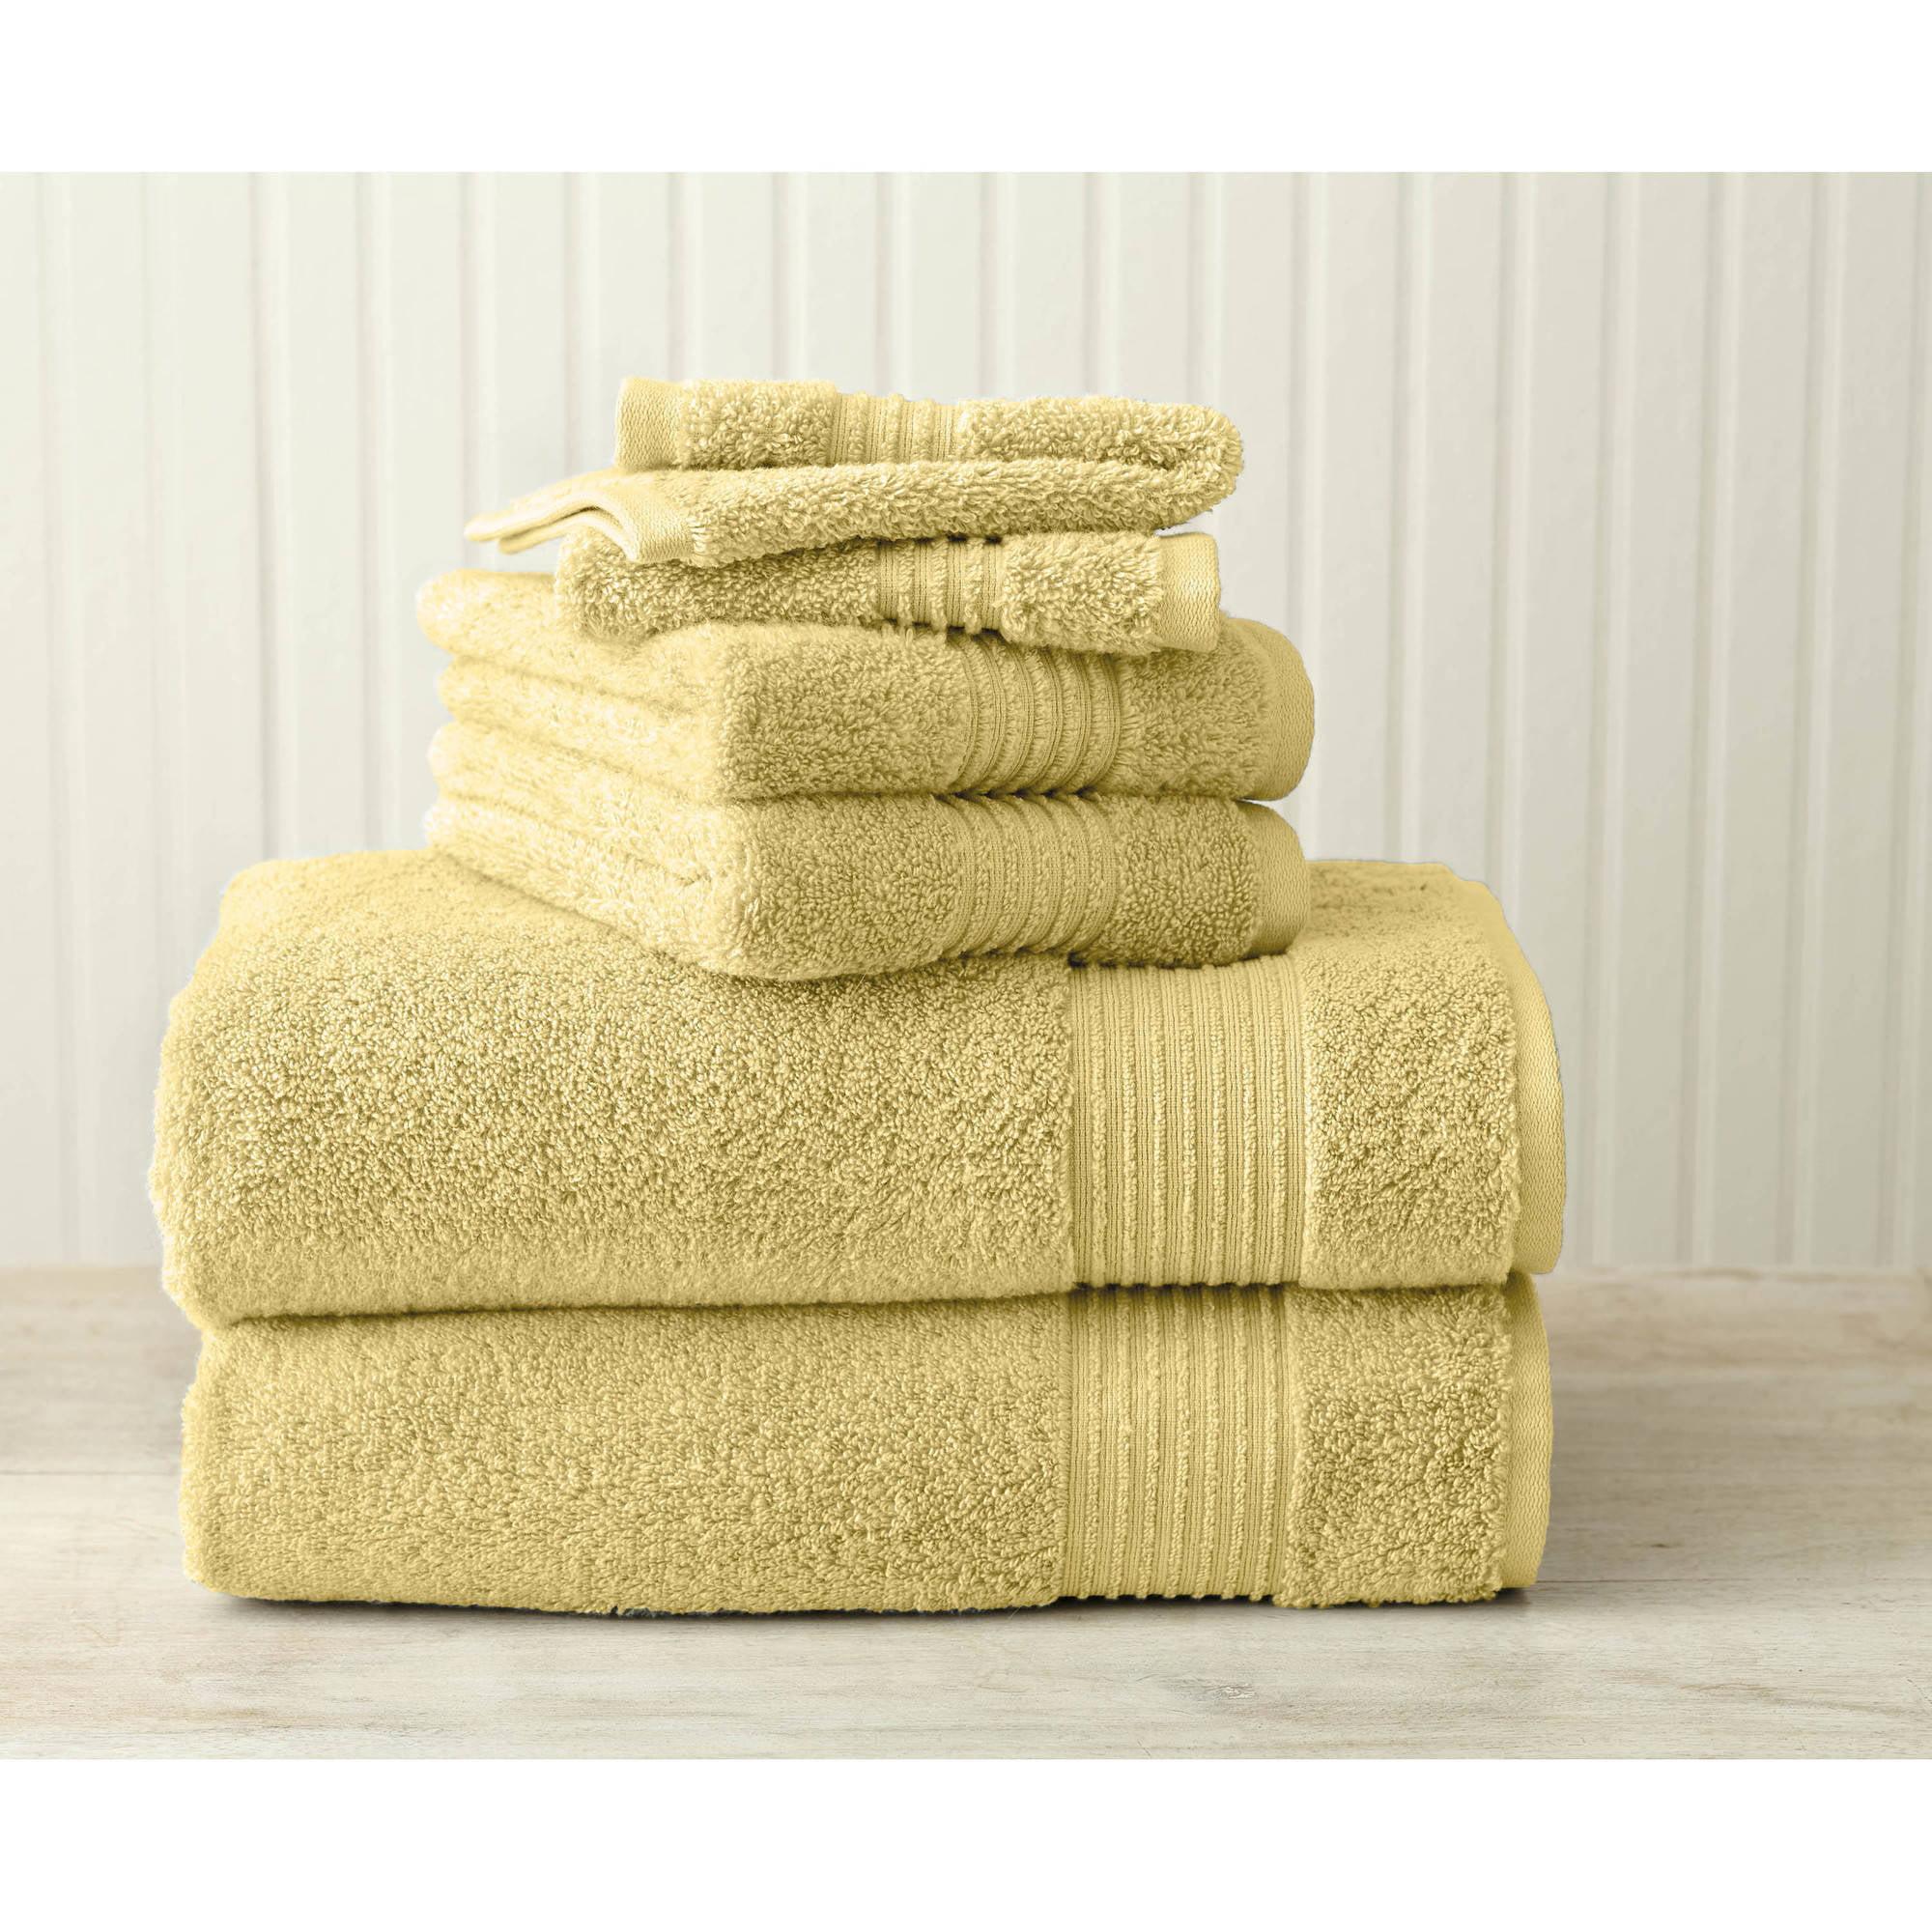 Bath Towels At Home Territory